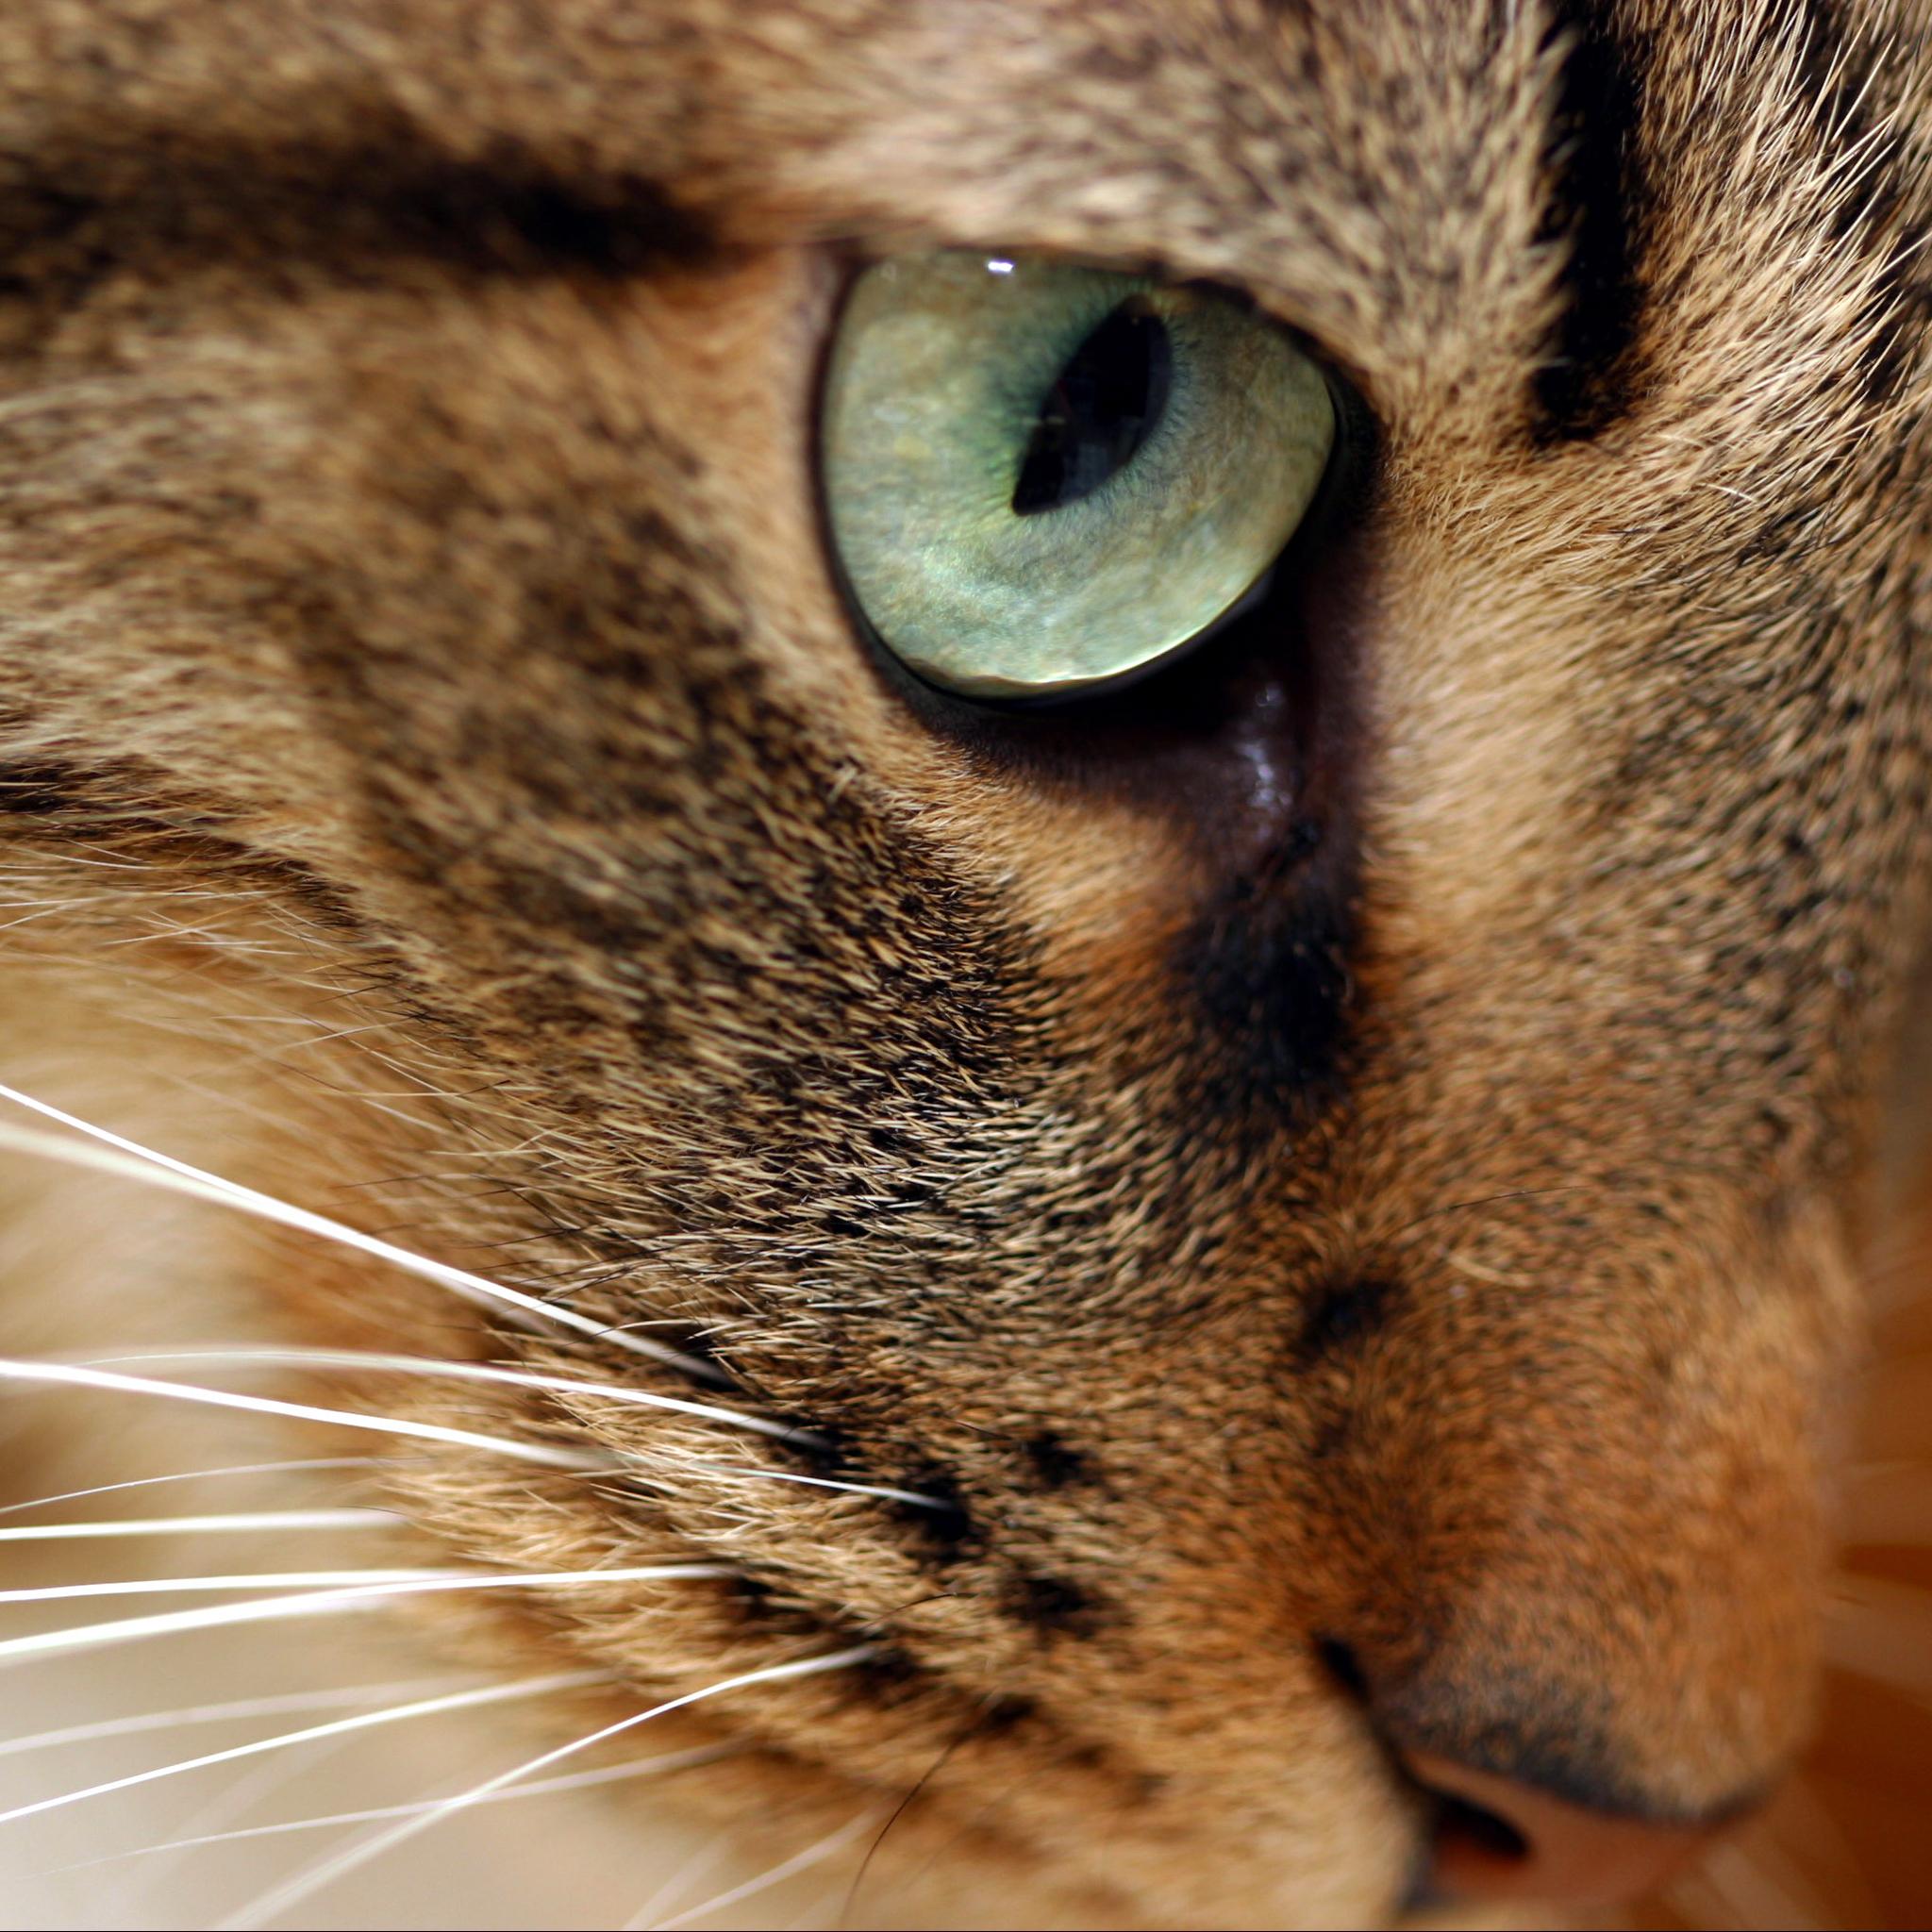 Eyes Cat 3Wallpapers iPad Eyes Cat   iPad